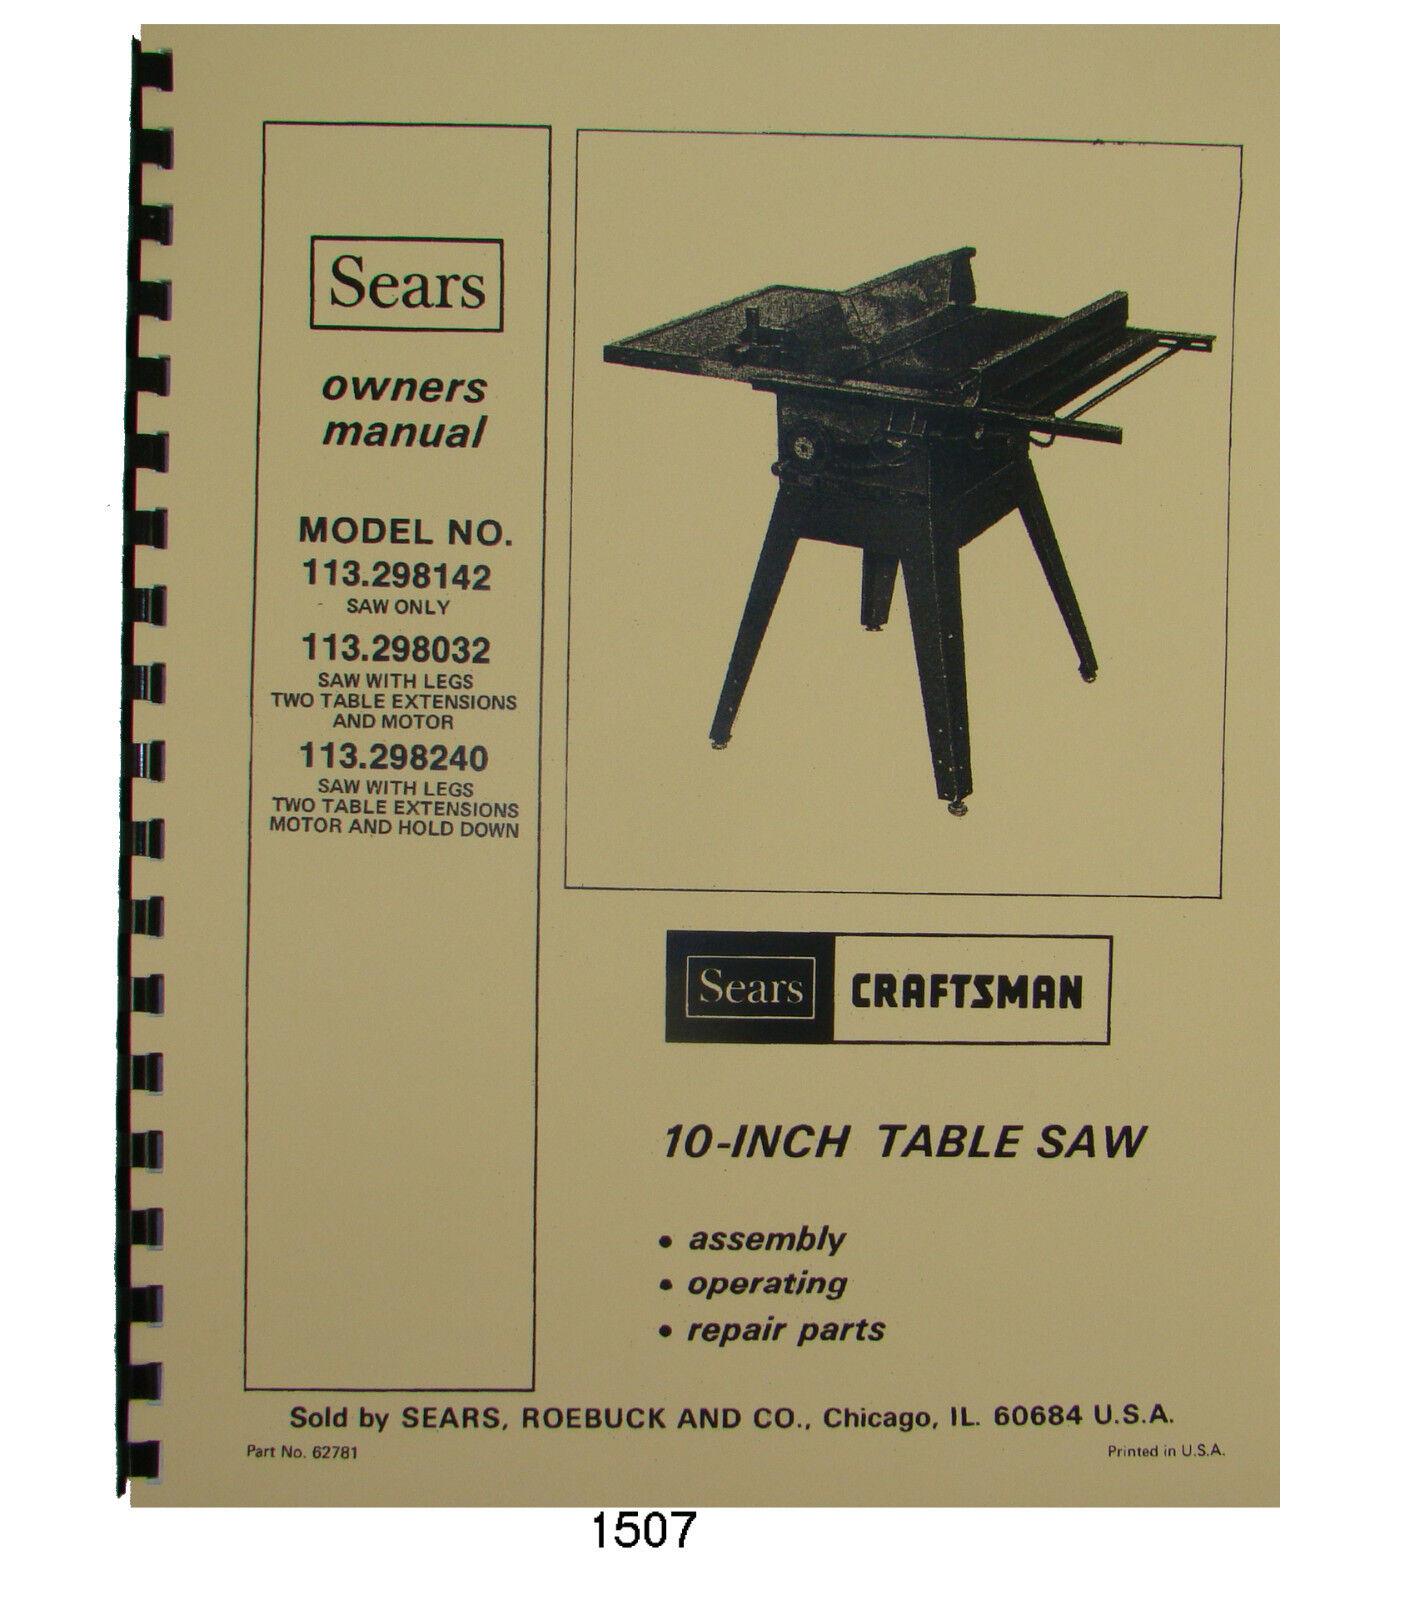 Sears Craftsman 113.298142,113.298032,113.298240 10